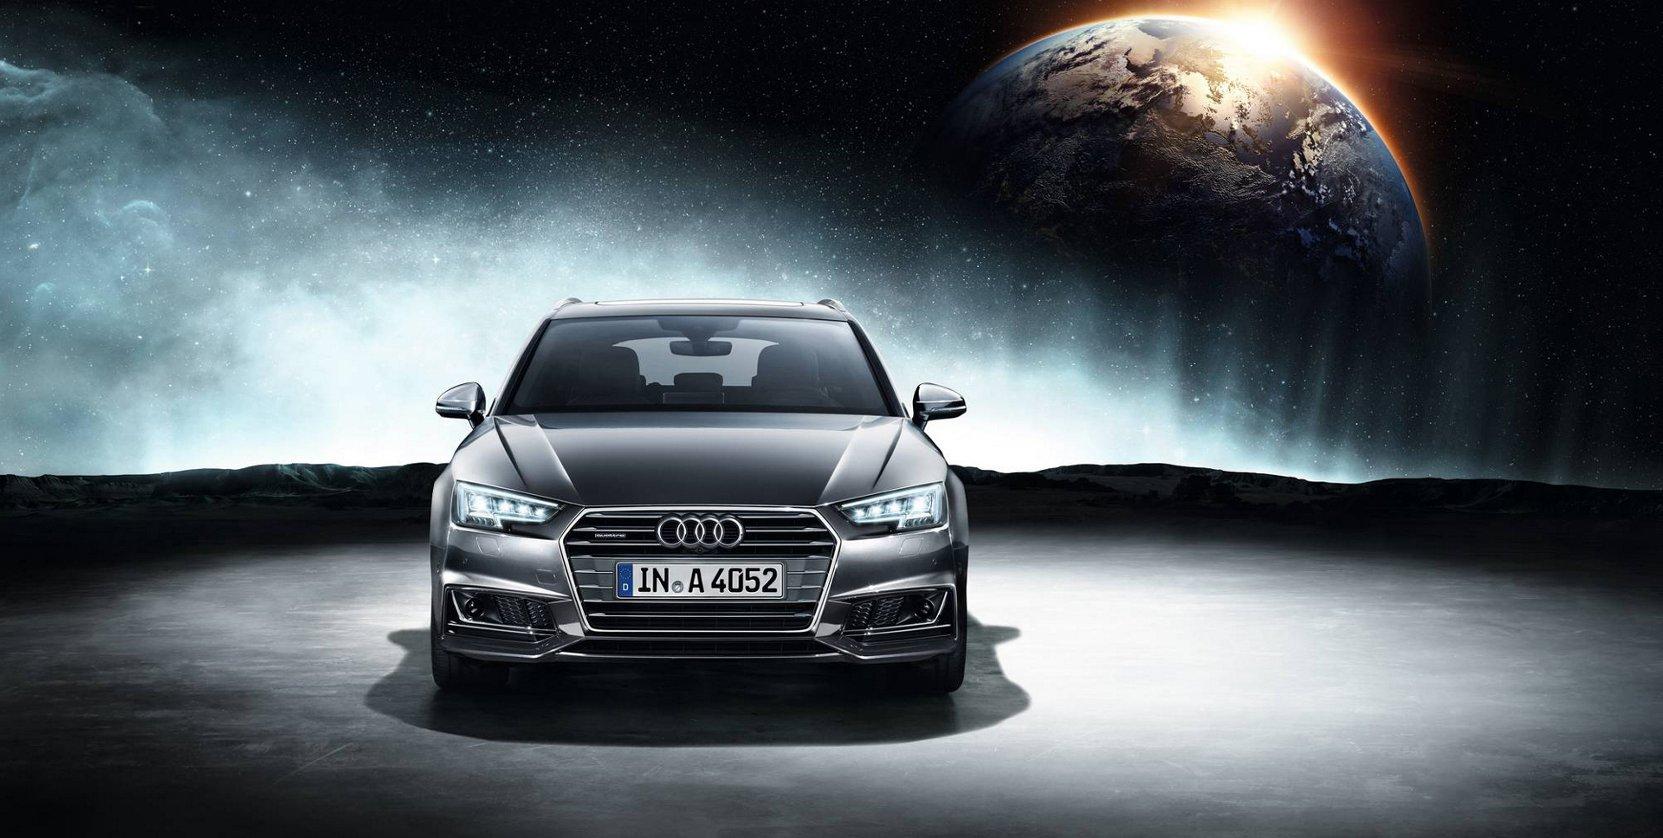 New 2017 Audi A4 Parsippany New Audi Cars